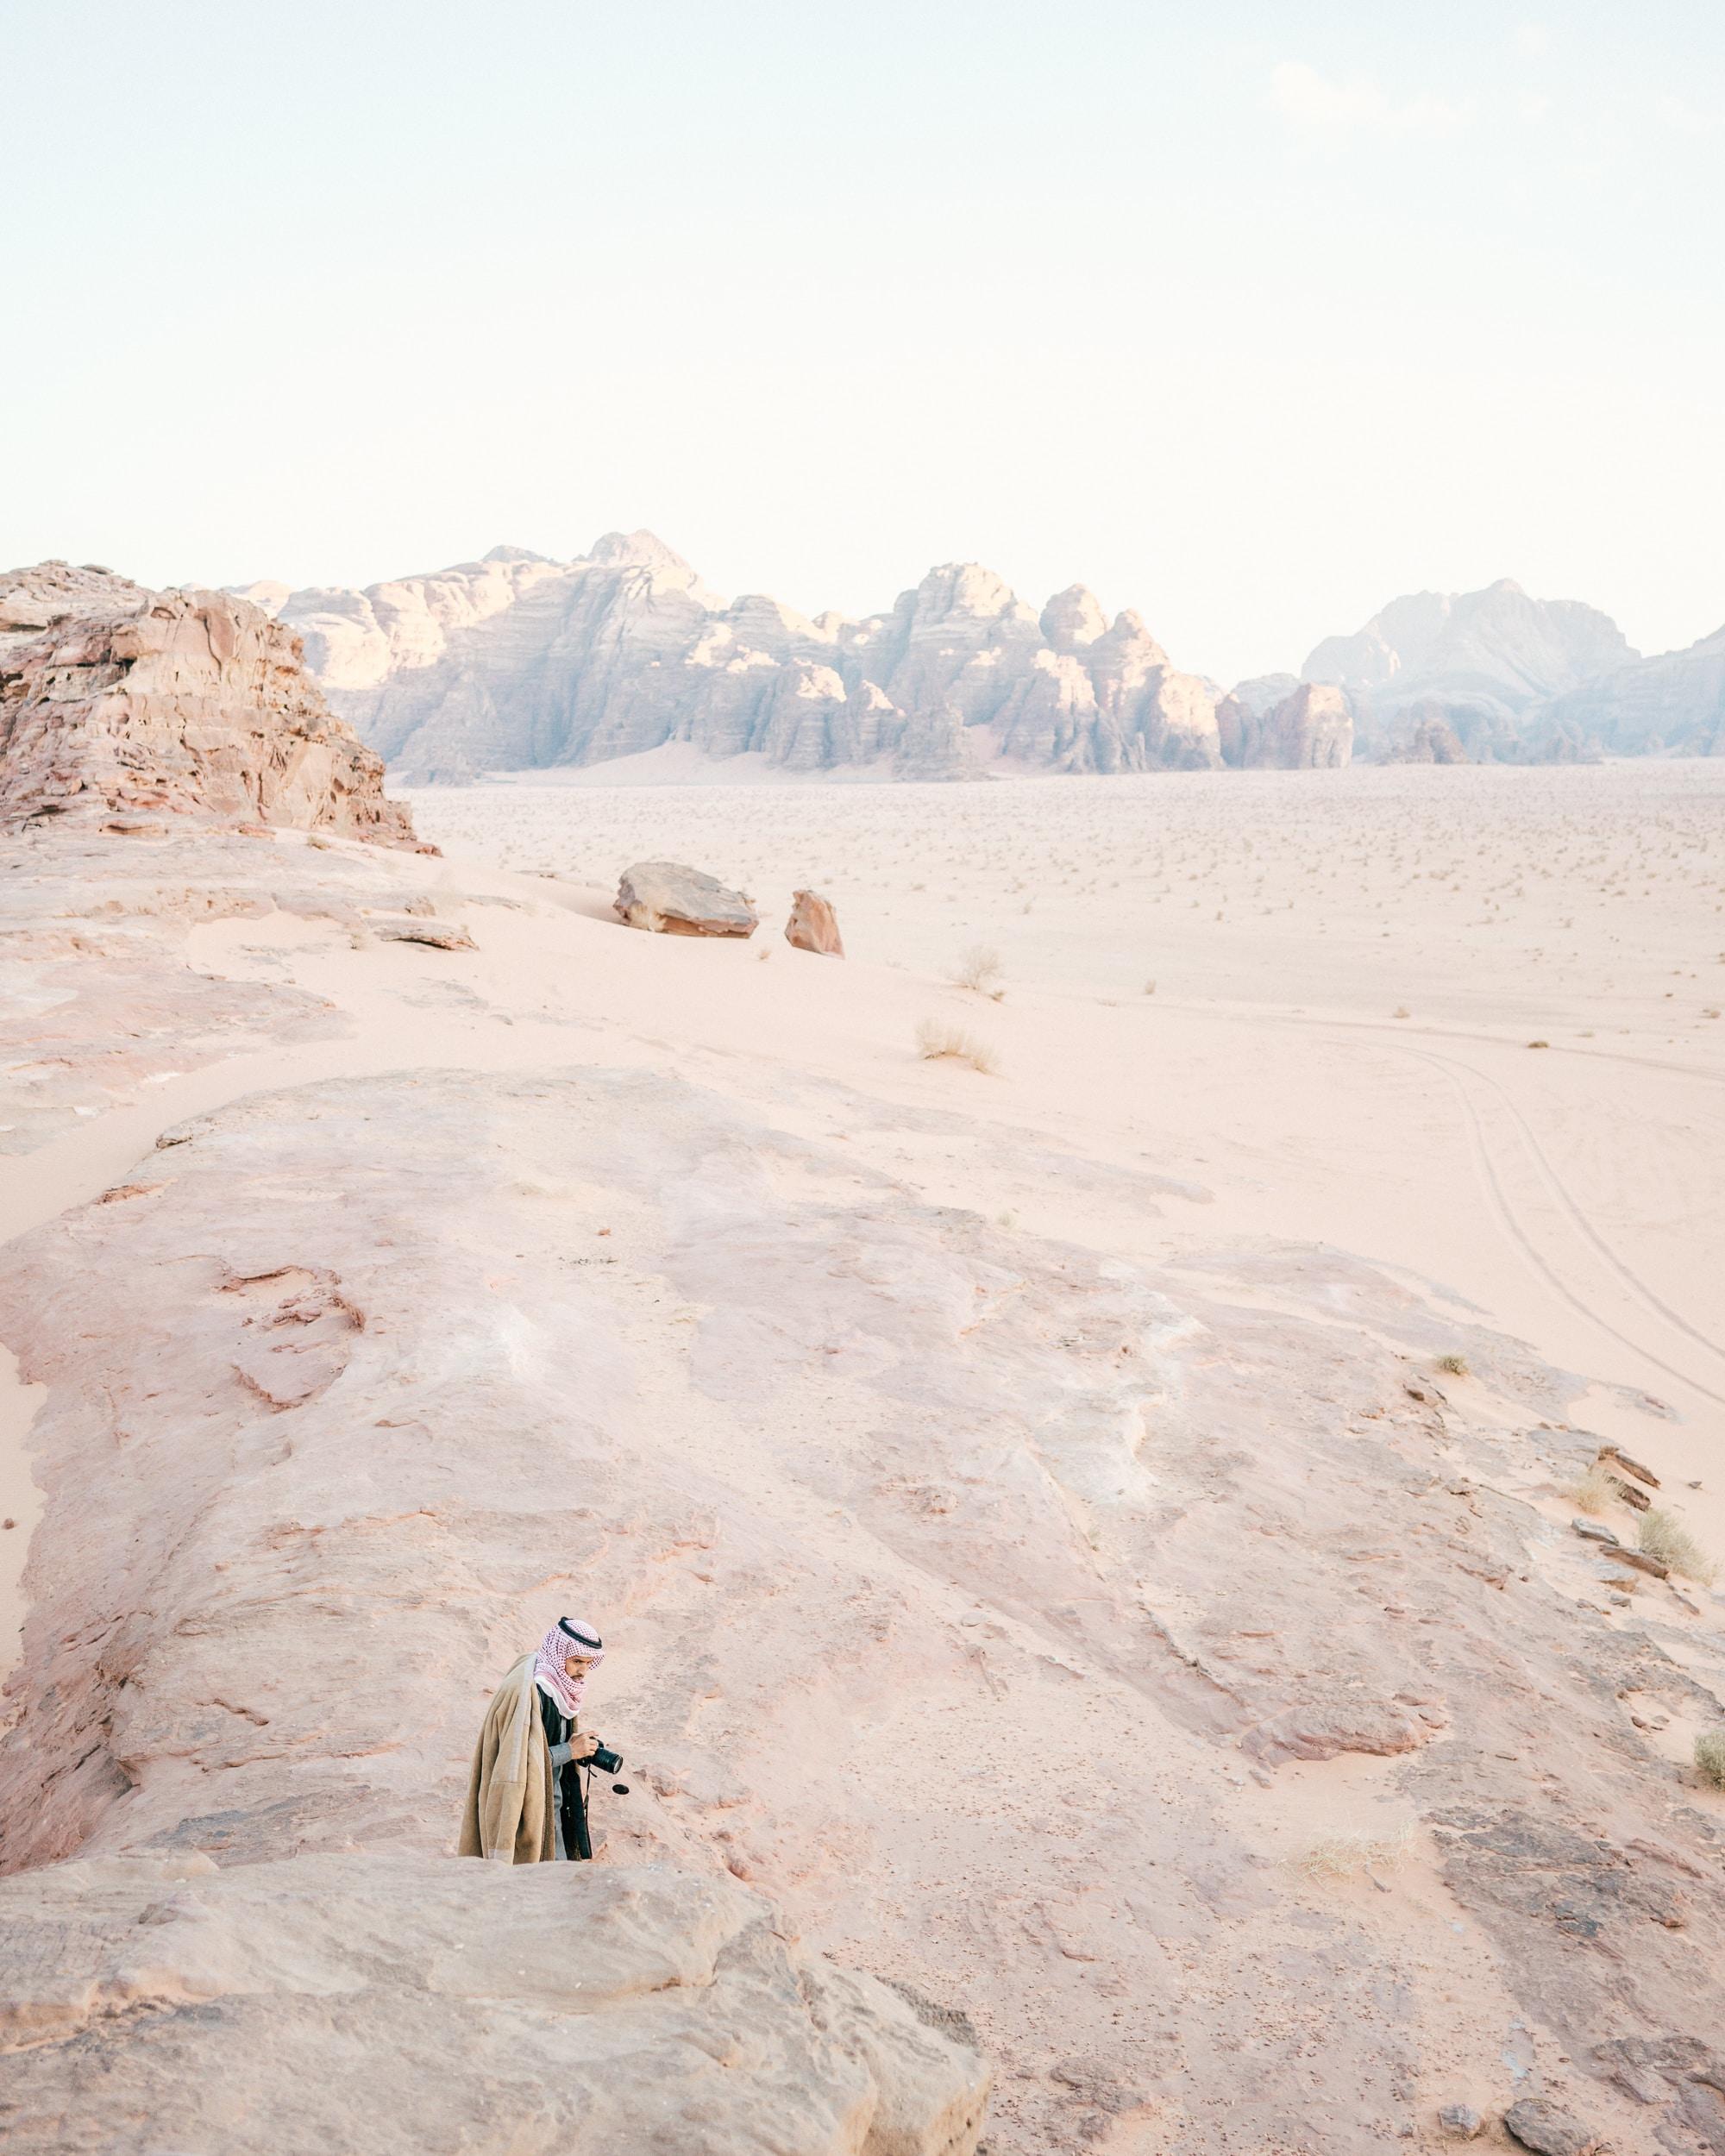 person standing on white sand desert